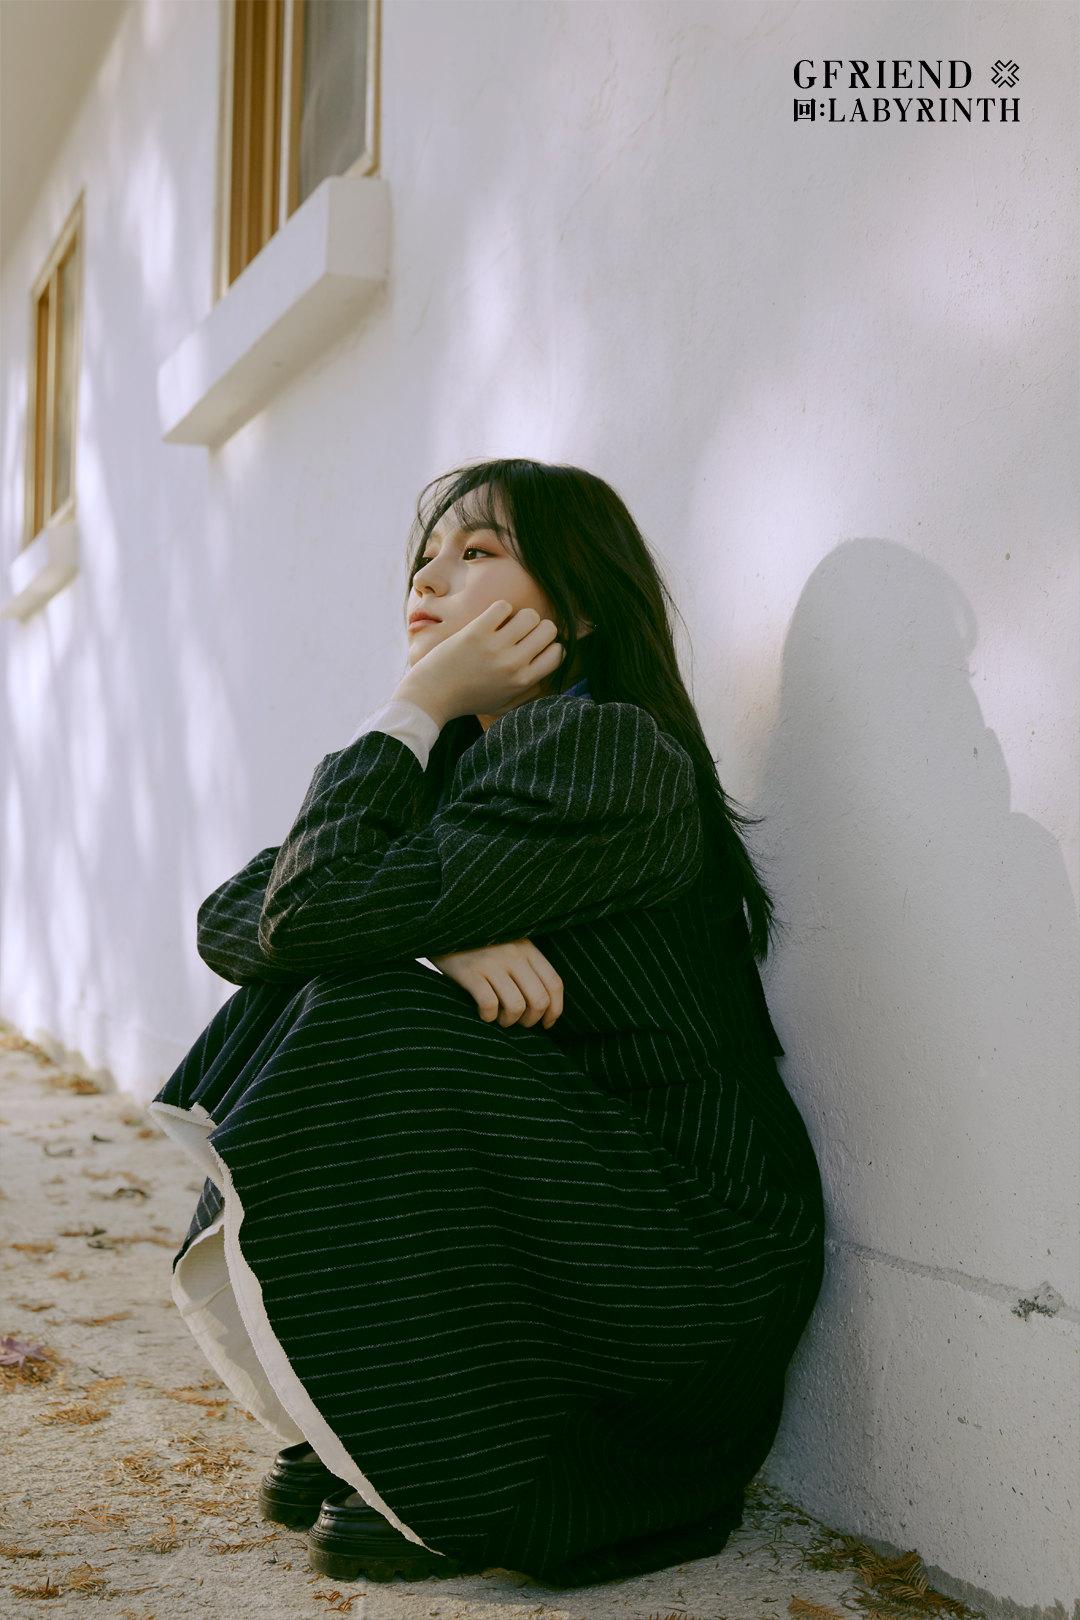 GFRIEND Umji Labyrinth Teaser